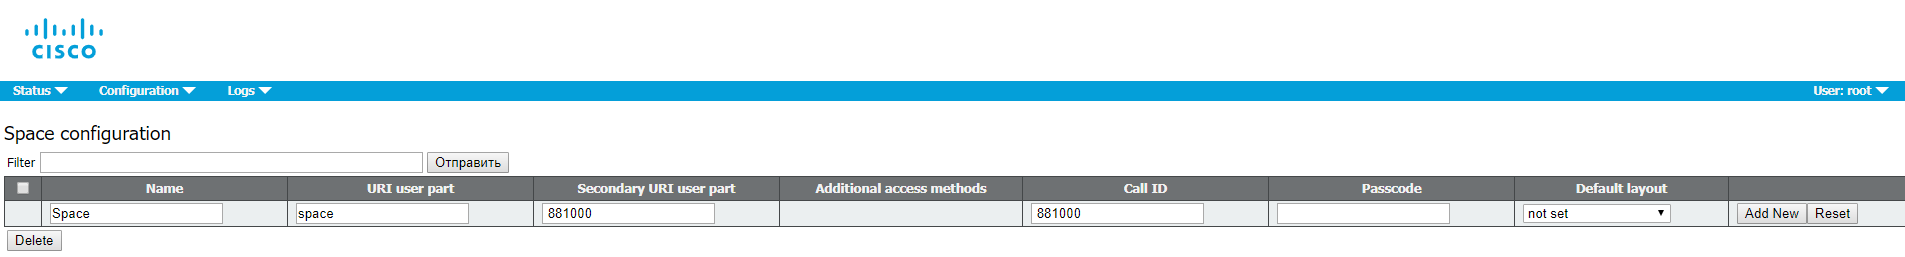 Cisco 7925g Asterisk